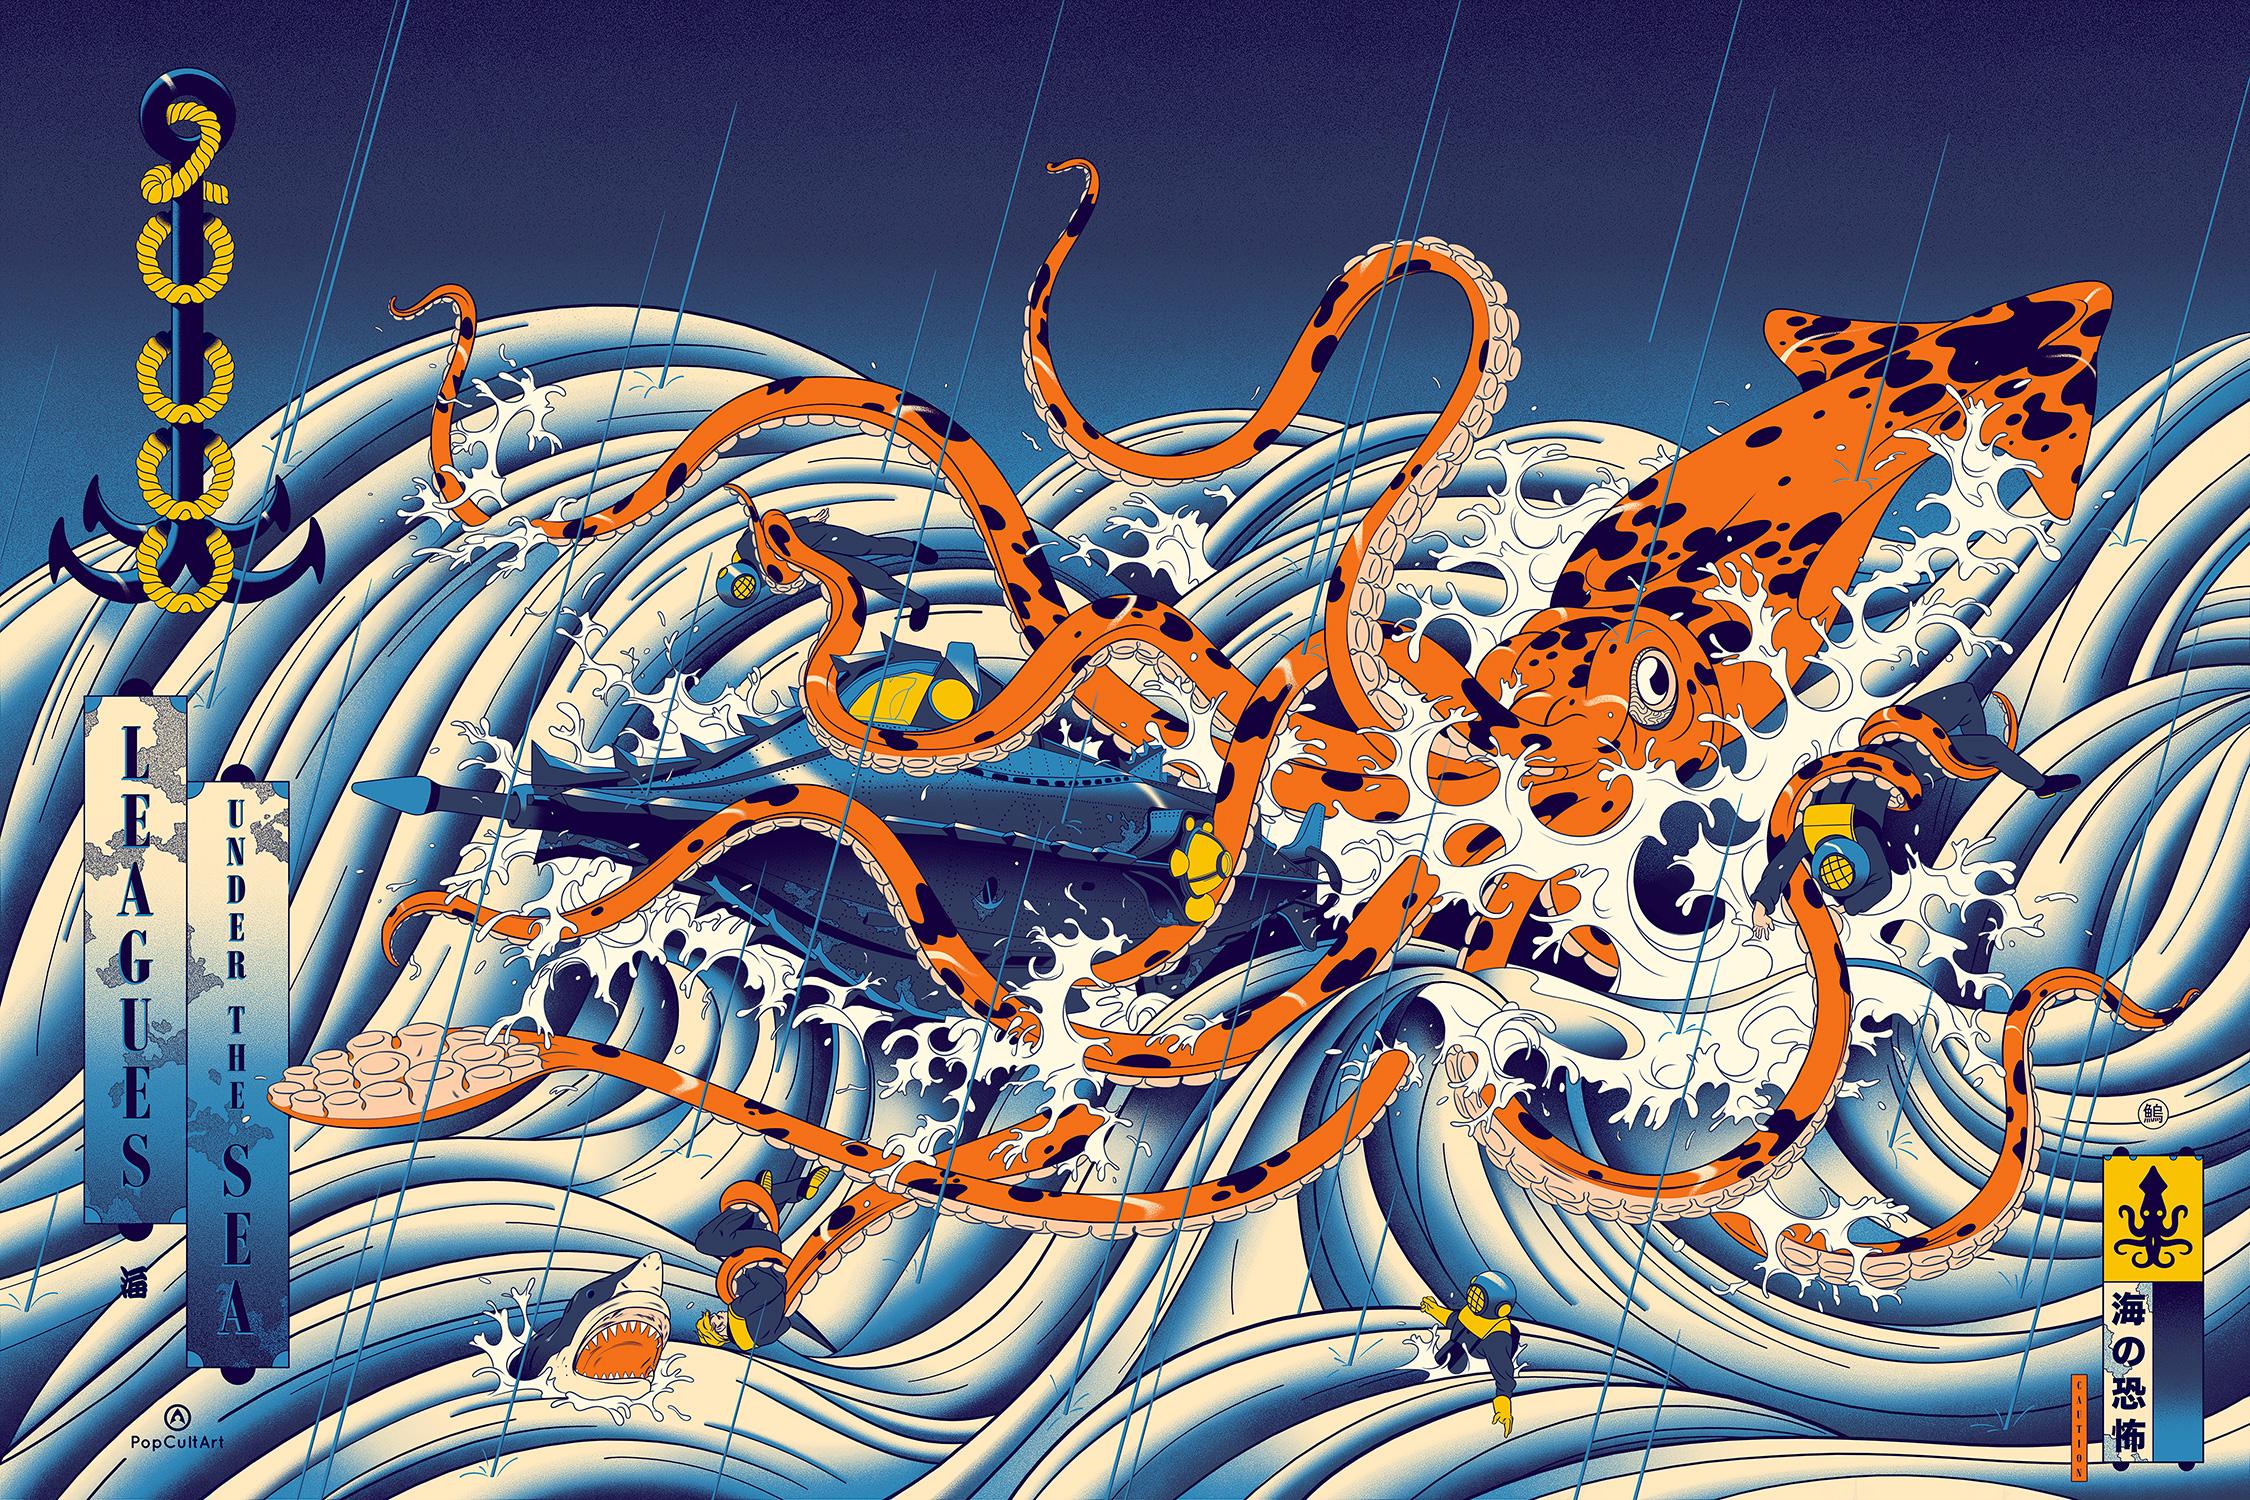 20,000 Leagues Under The Sea — Film Poster Screenprint